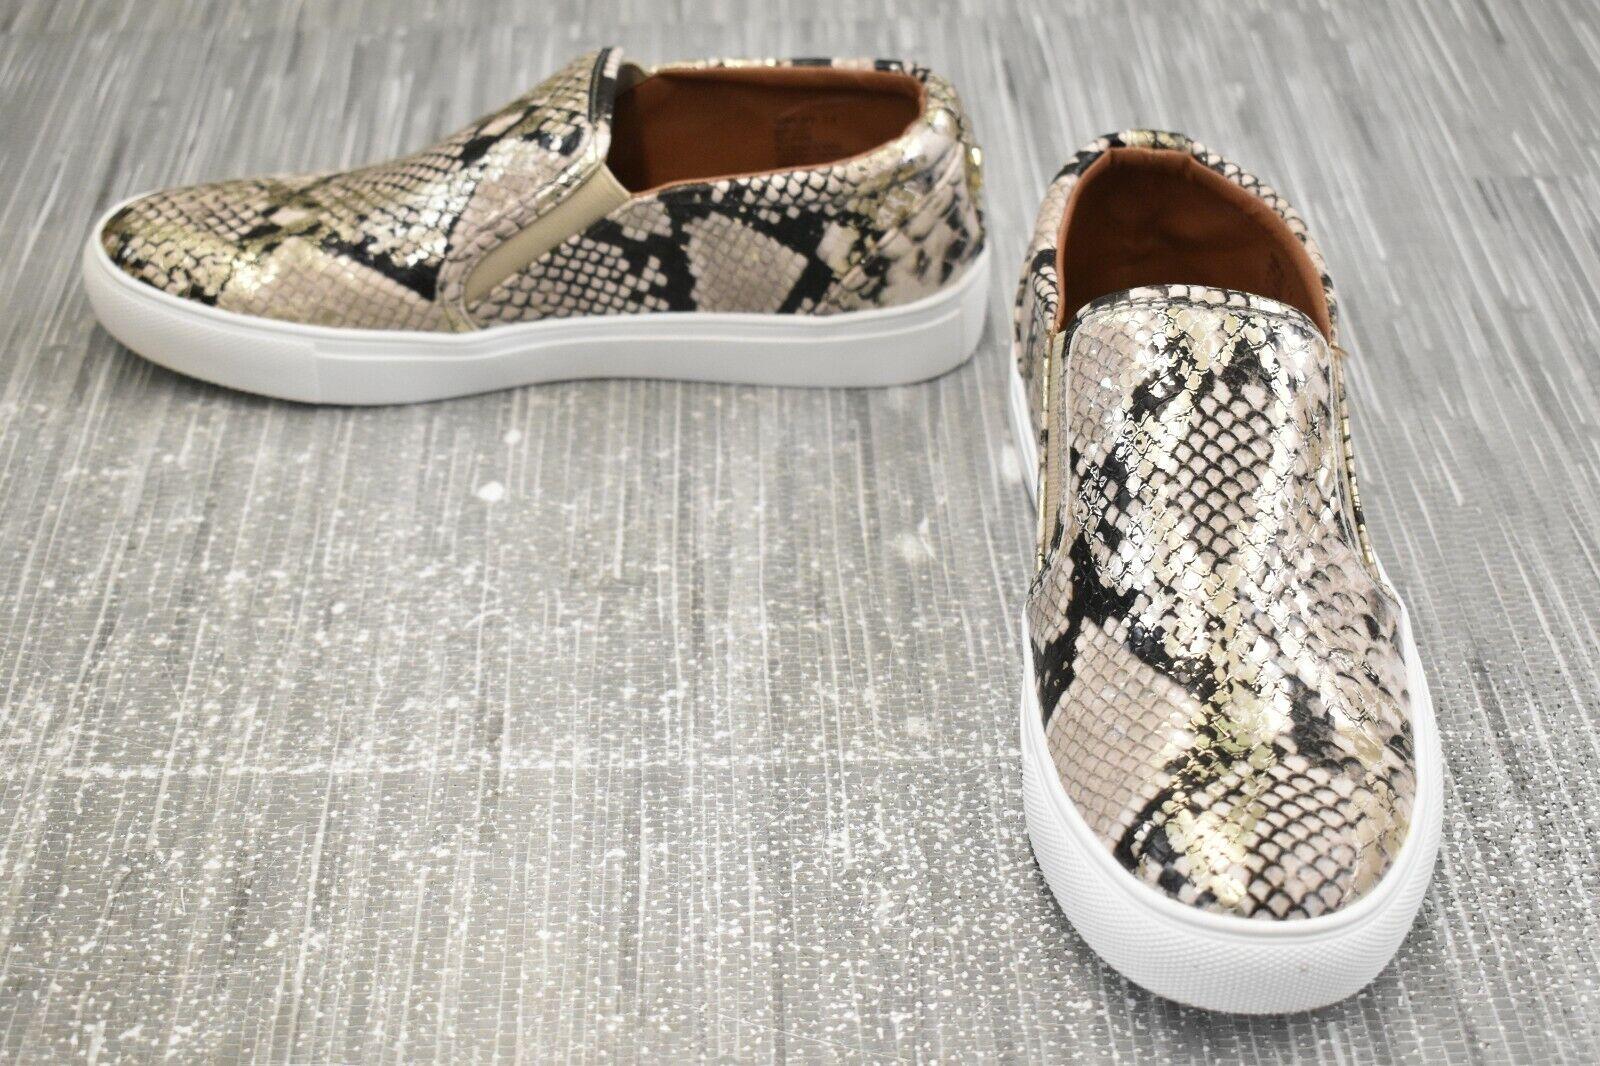 **Steve Madden Amplify AMPL02S1 Comfort Shoe - Women's Size 7.5, Gold Snake